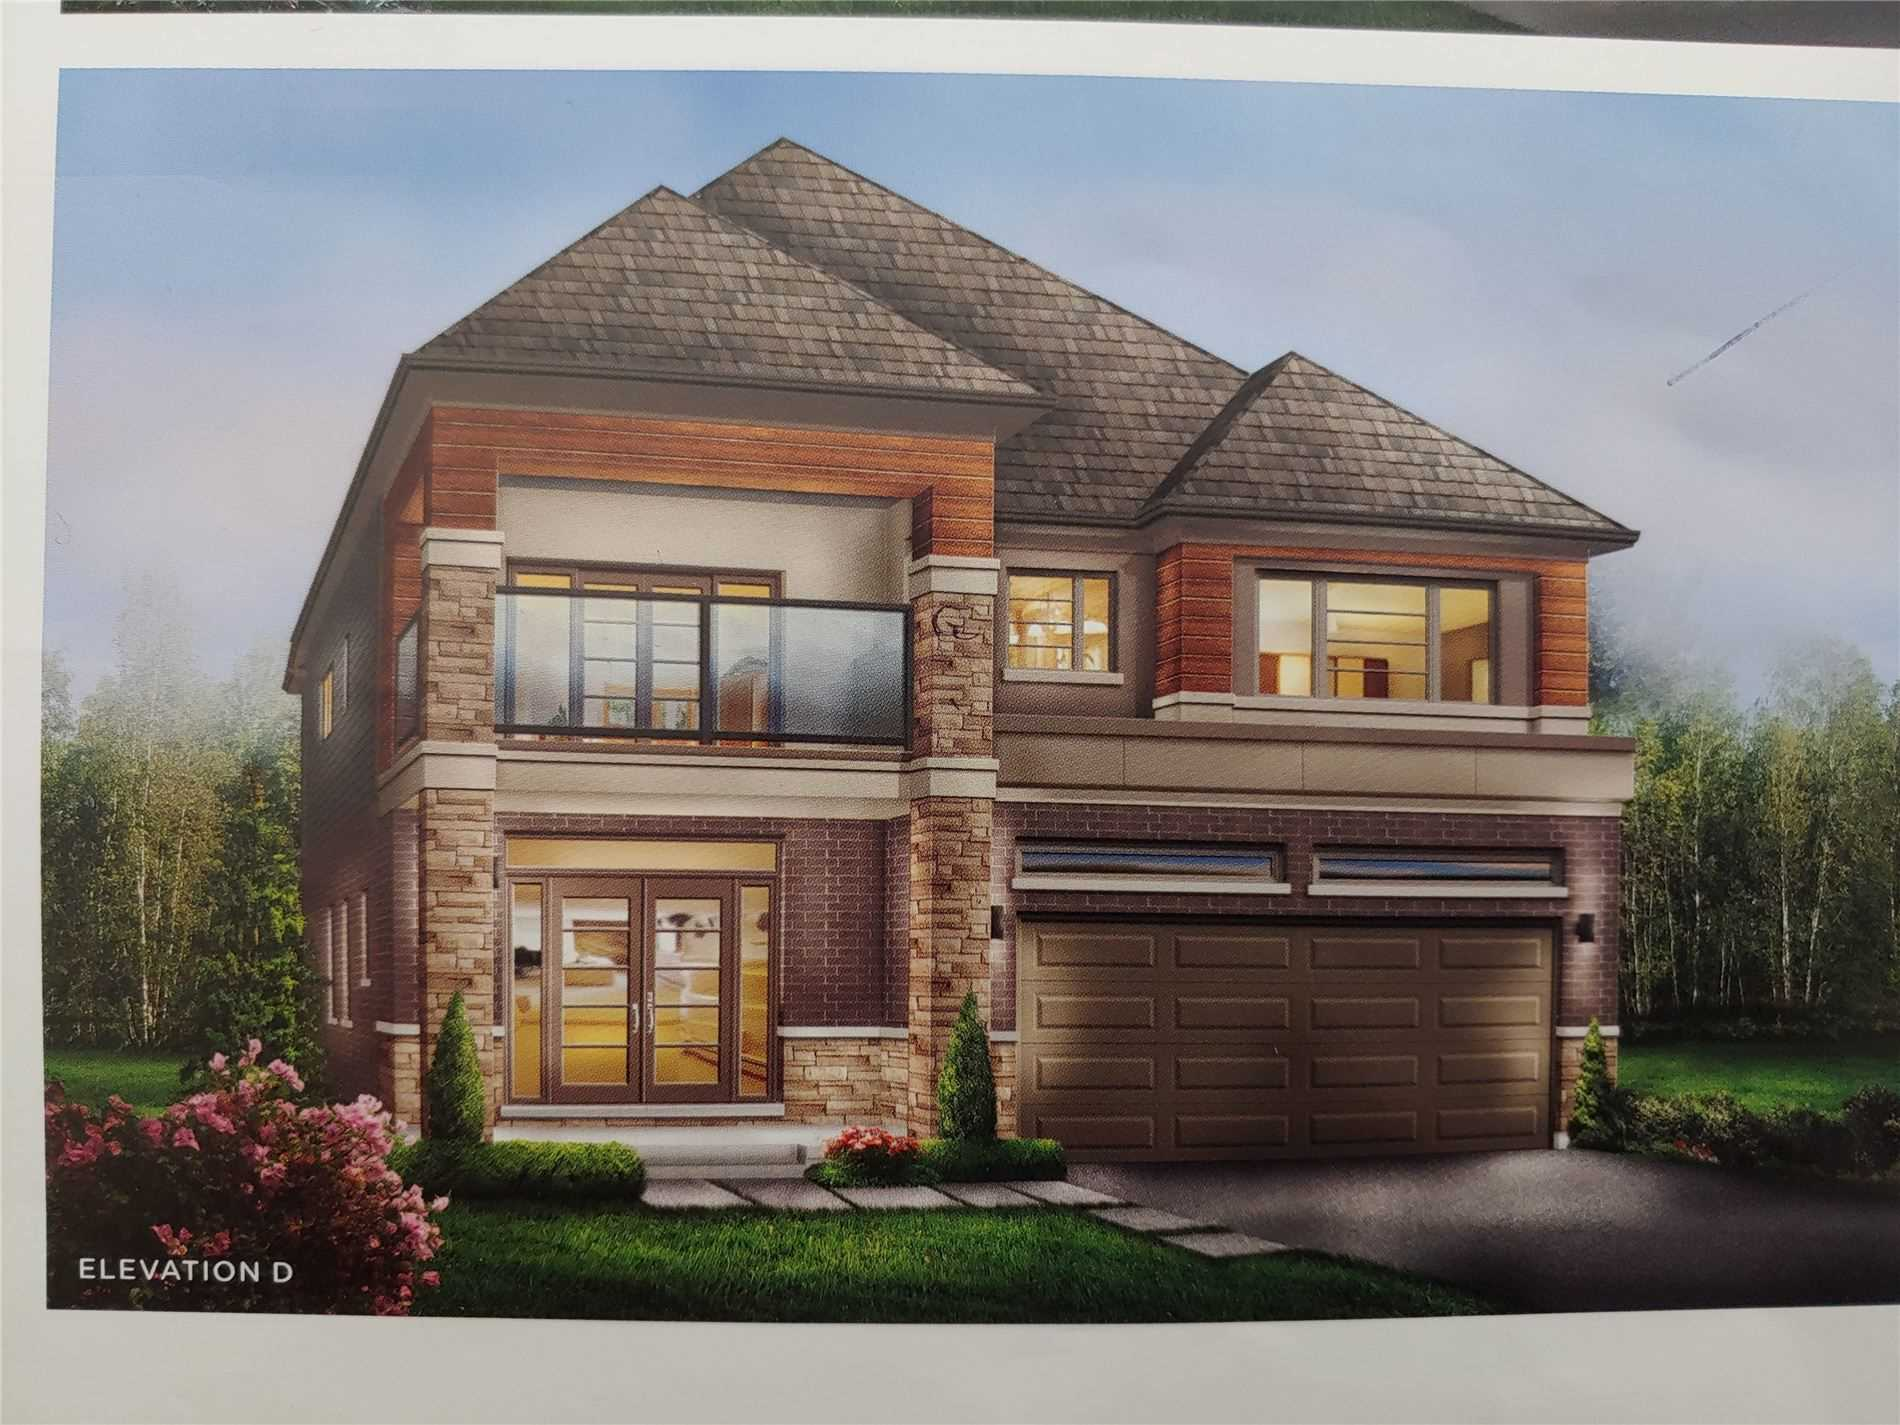 42 Rowley St, Brantford, Ontario N3S0J4, 4 Bedrooms Bedrooms, 10 Rooms Rooms,4 BathroomsBathrooms,Detached,For Sale,Rowley,X5118502